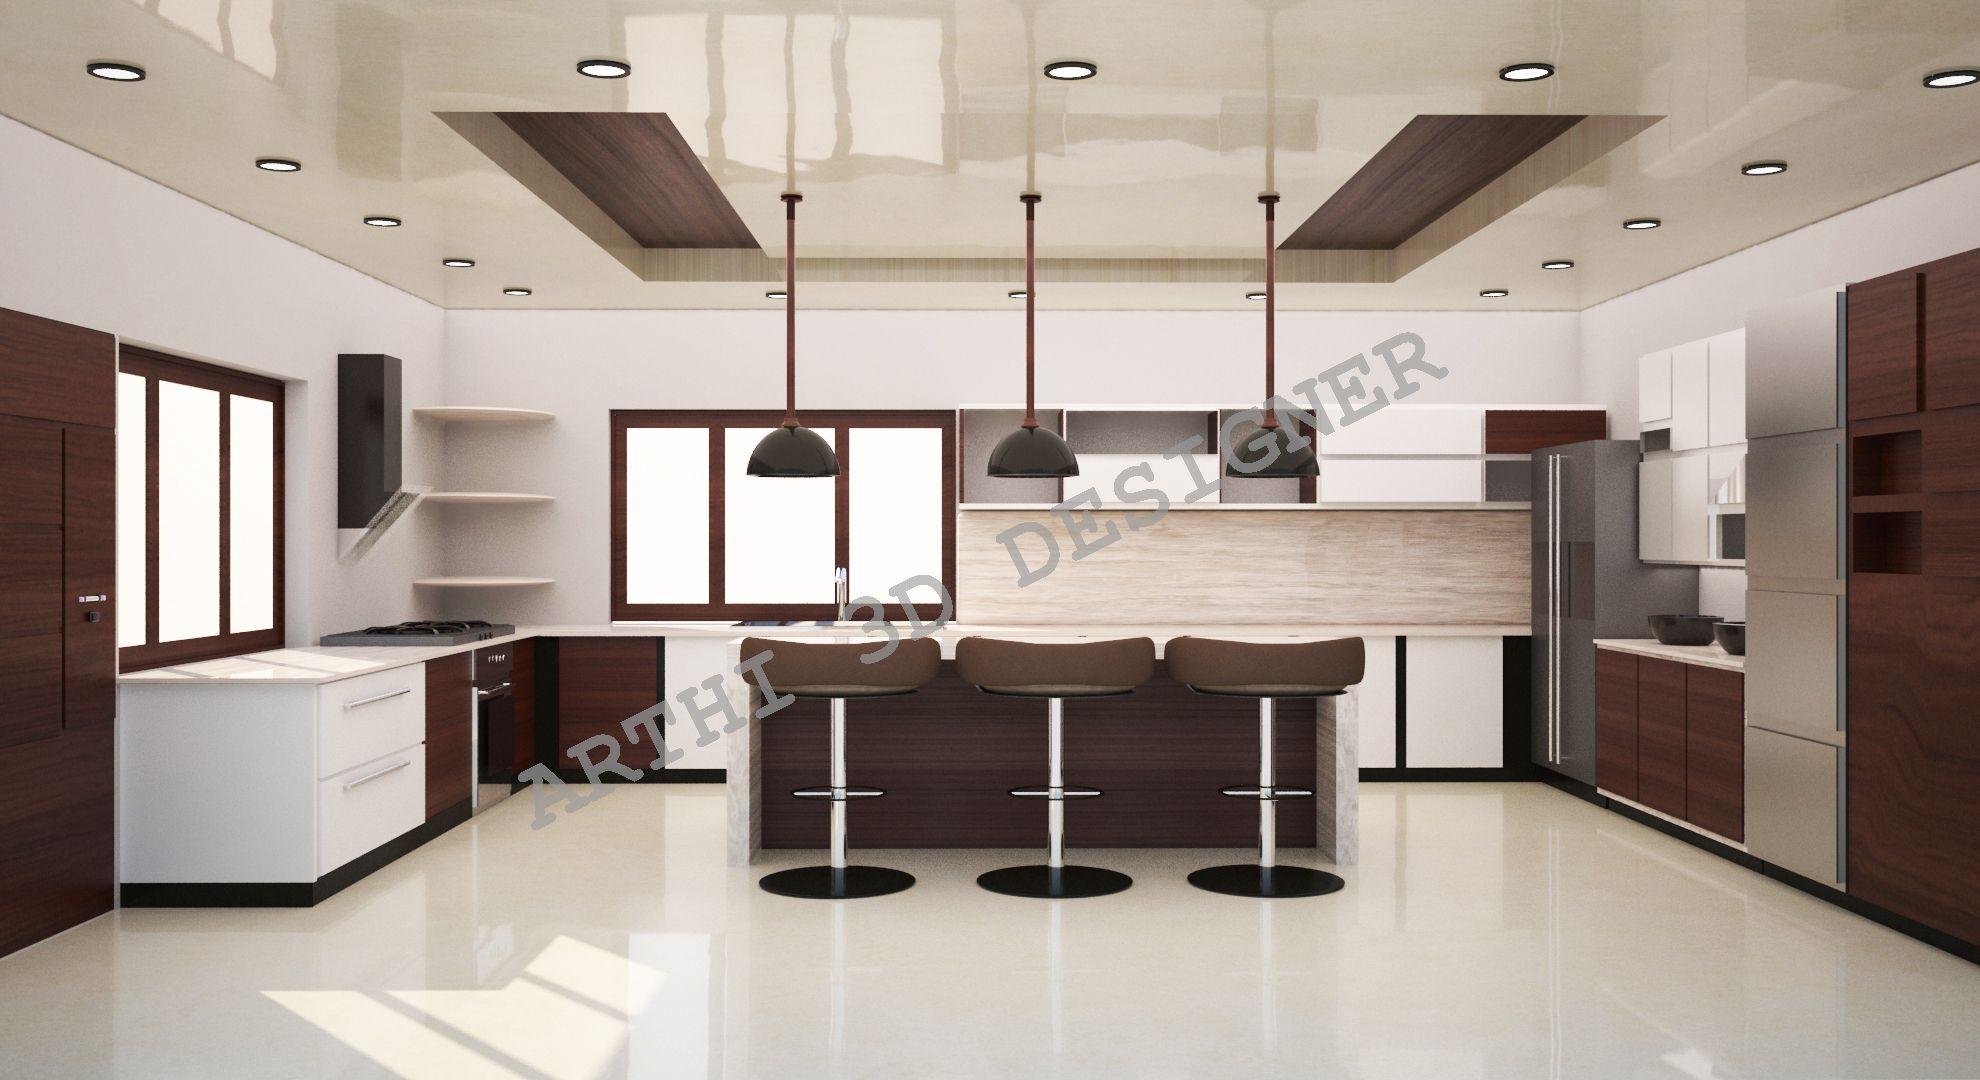 Realistic 3d Architectural Modular Kitchen Design Interior